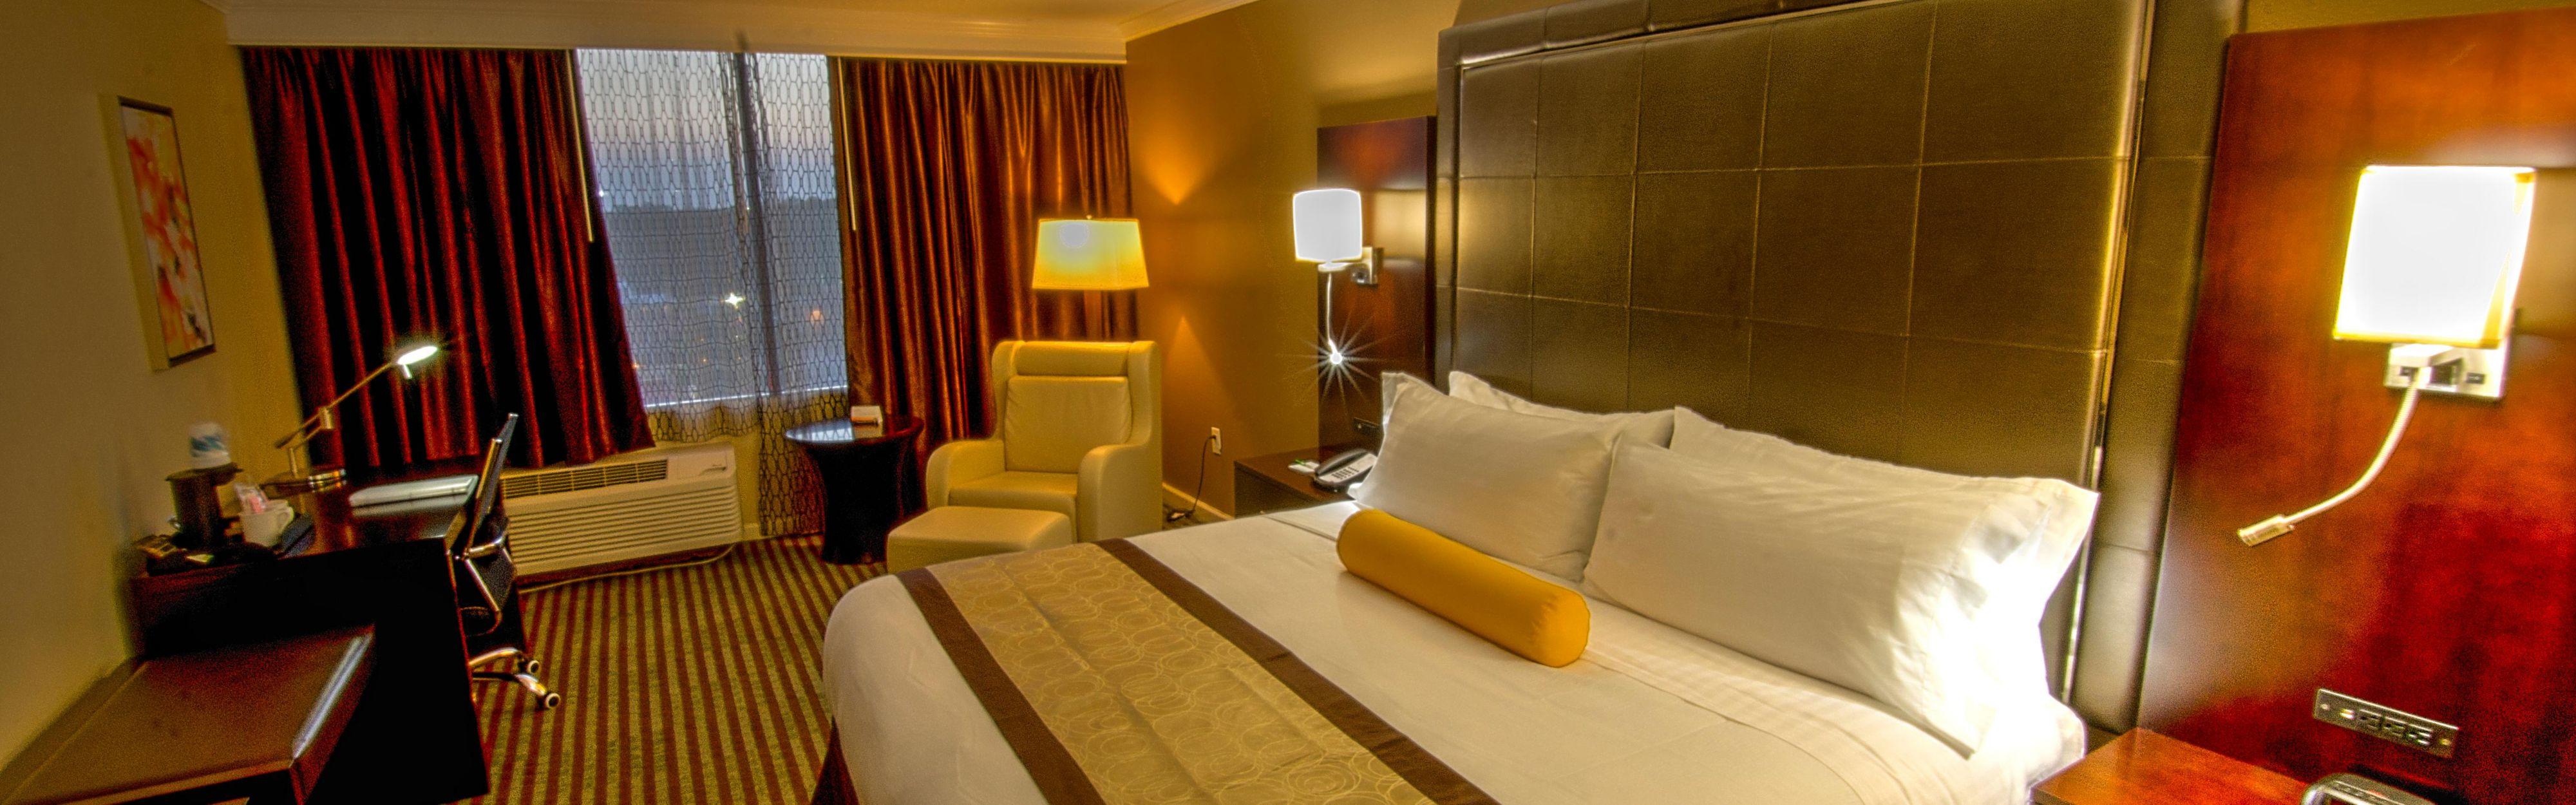 Holiday Inn Orlando East Ucf Area Orlando Florida Fl